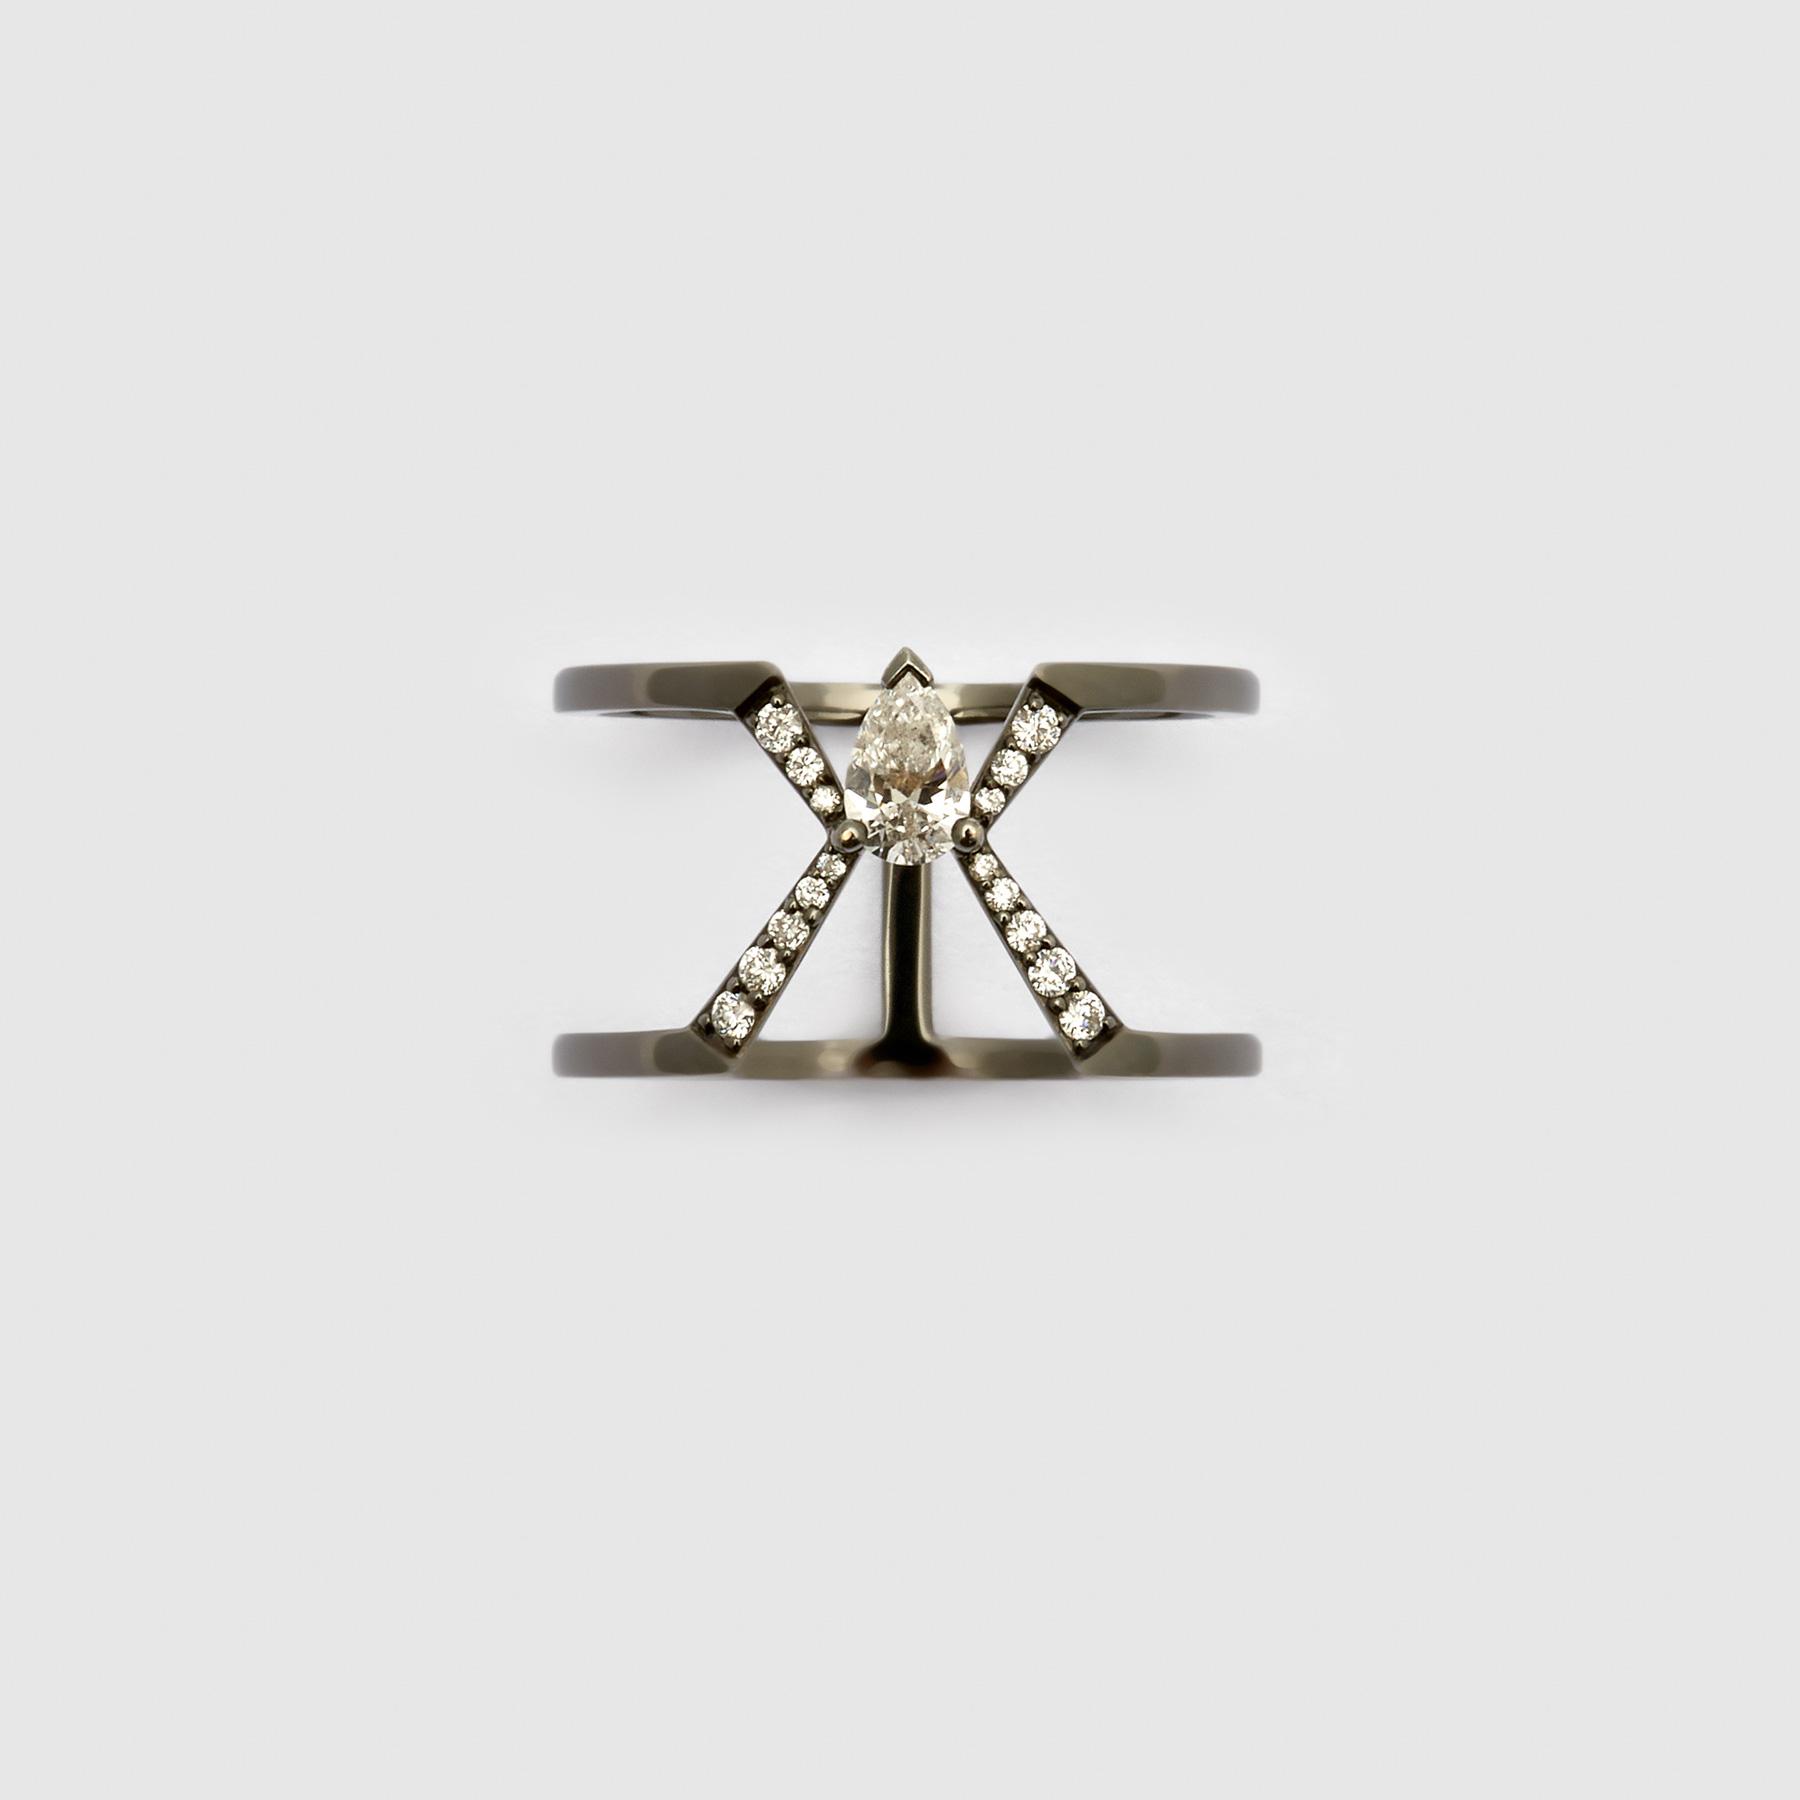 jewellery_10_sept--1293.jpg